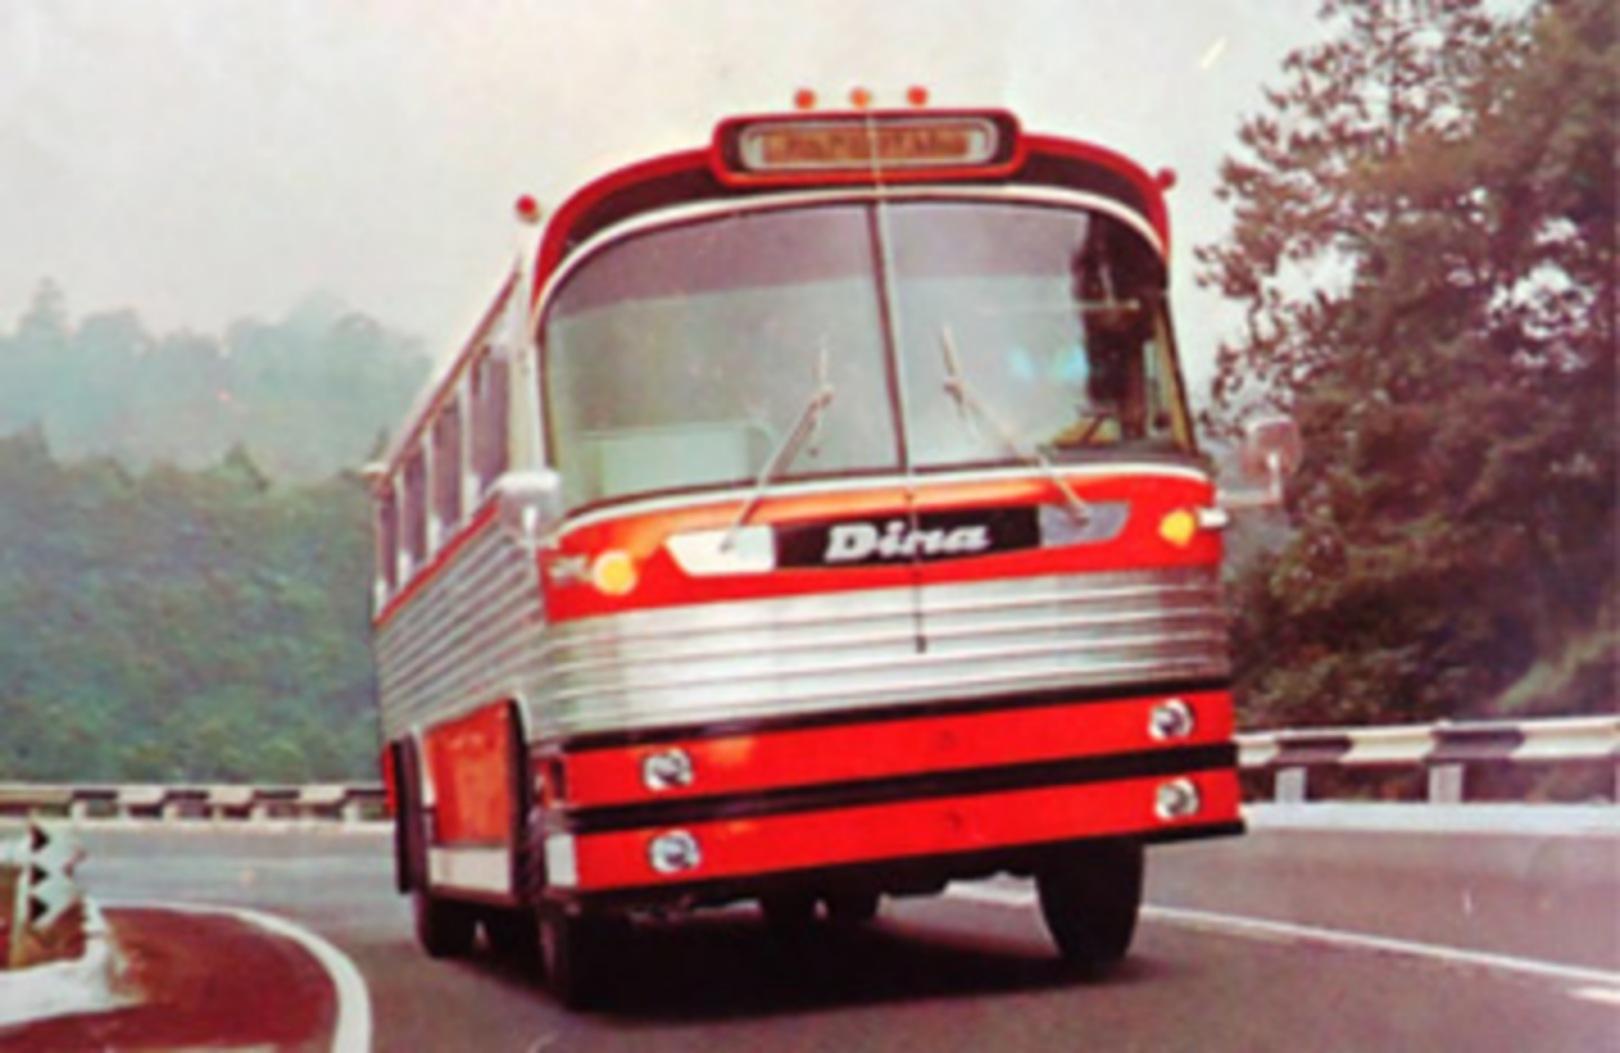 DINA 70 años autobuses